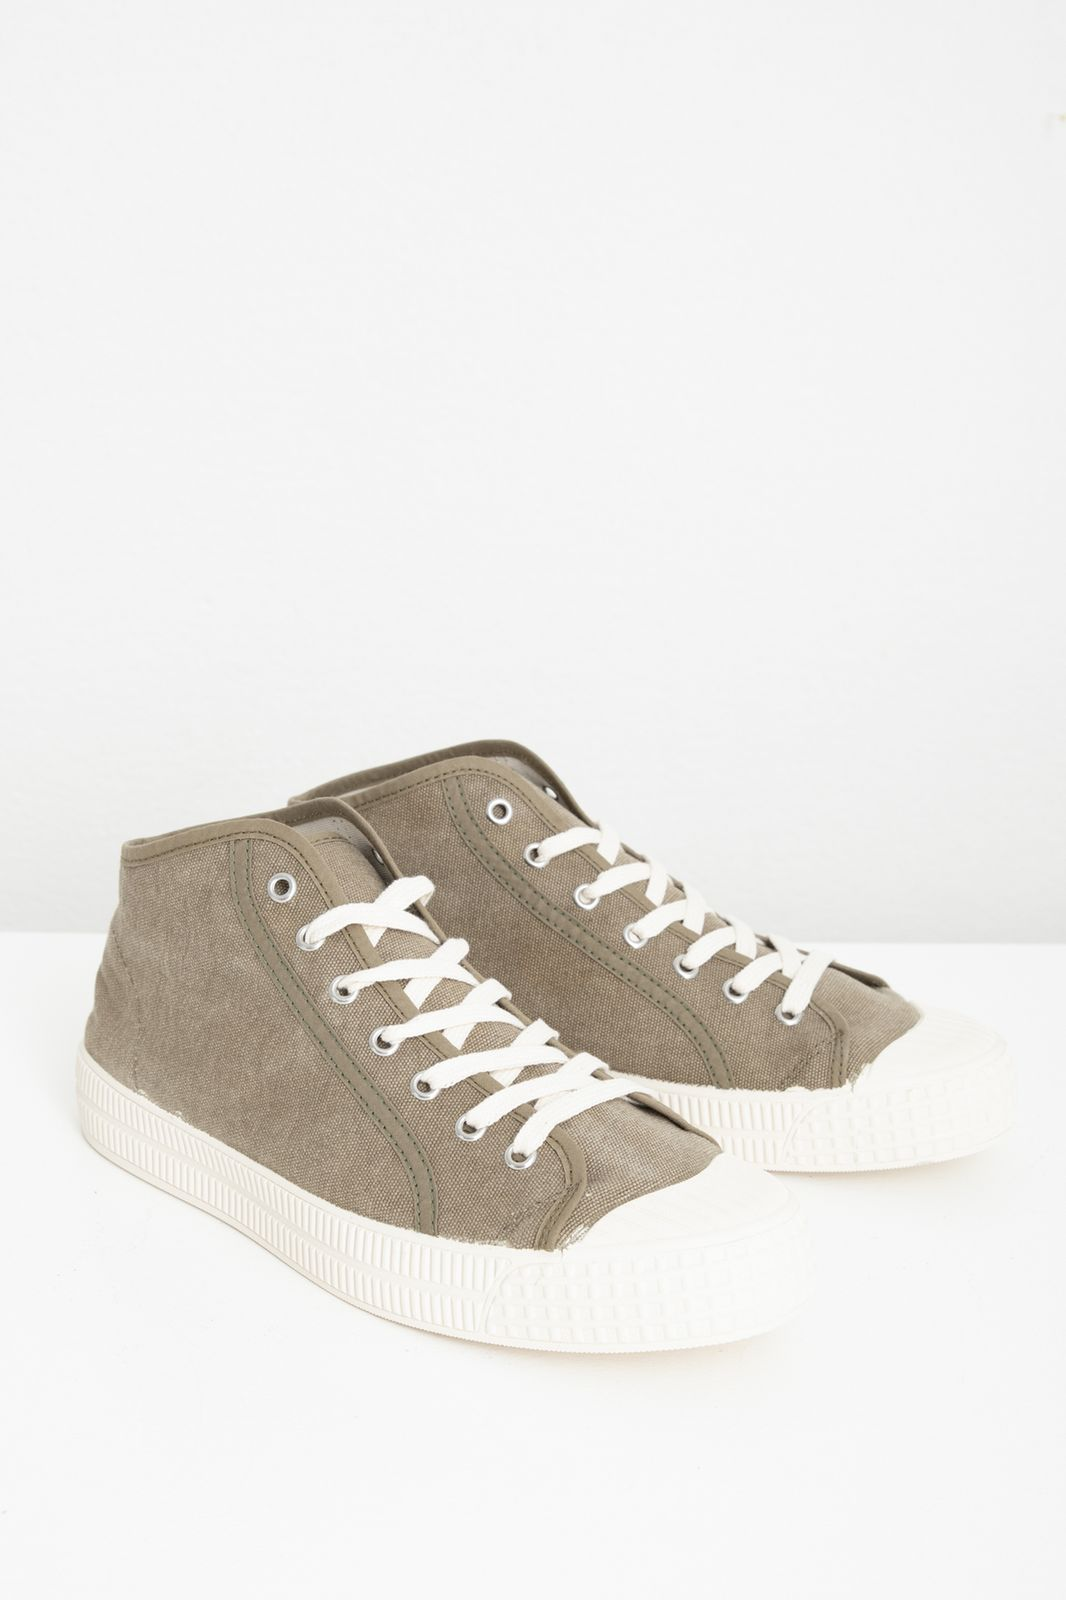 Hoge taupe canvas sneakers - Heren   Sissy-Boy